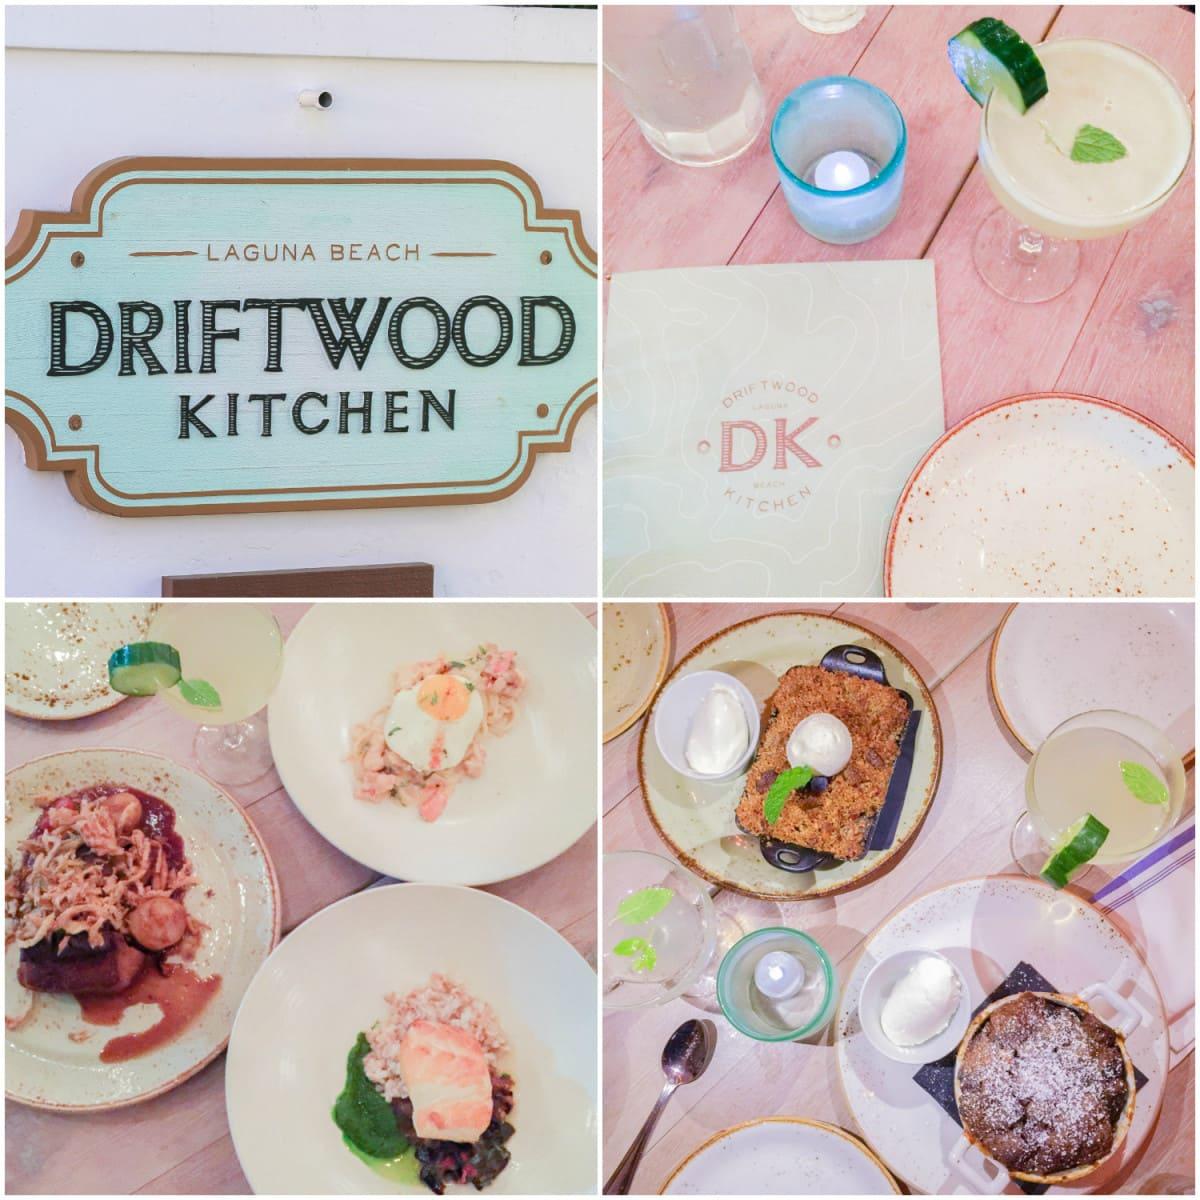 Driftwood Kitchen restaurant in Laguna Beach, California